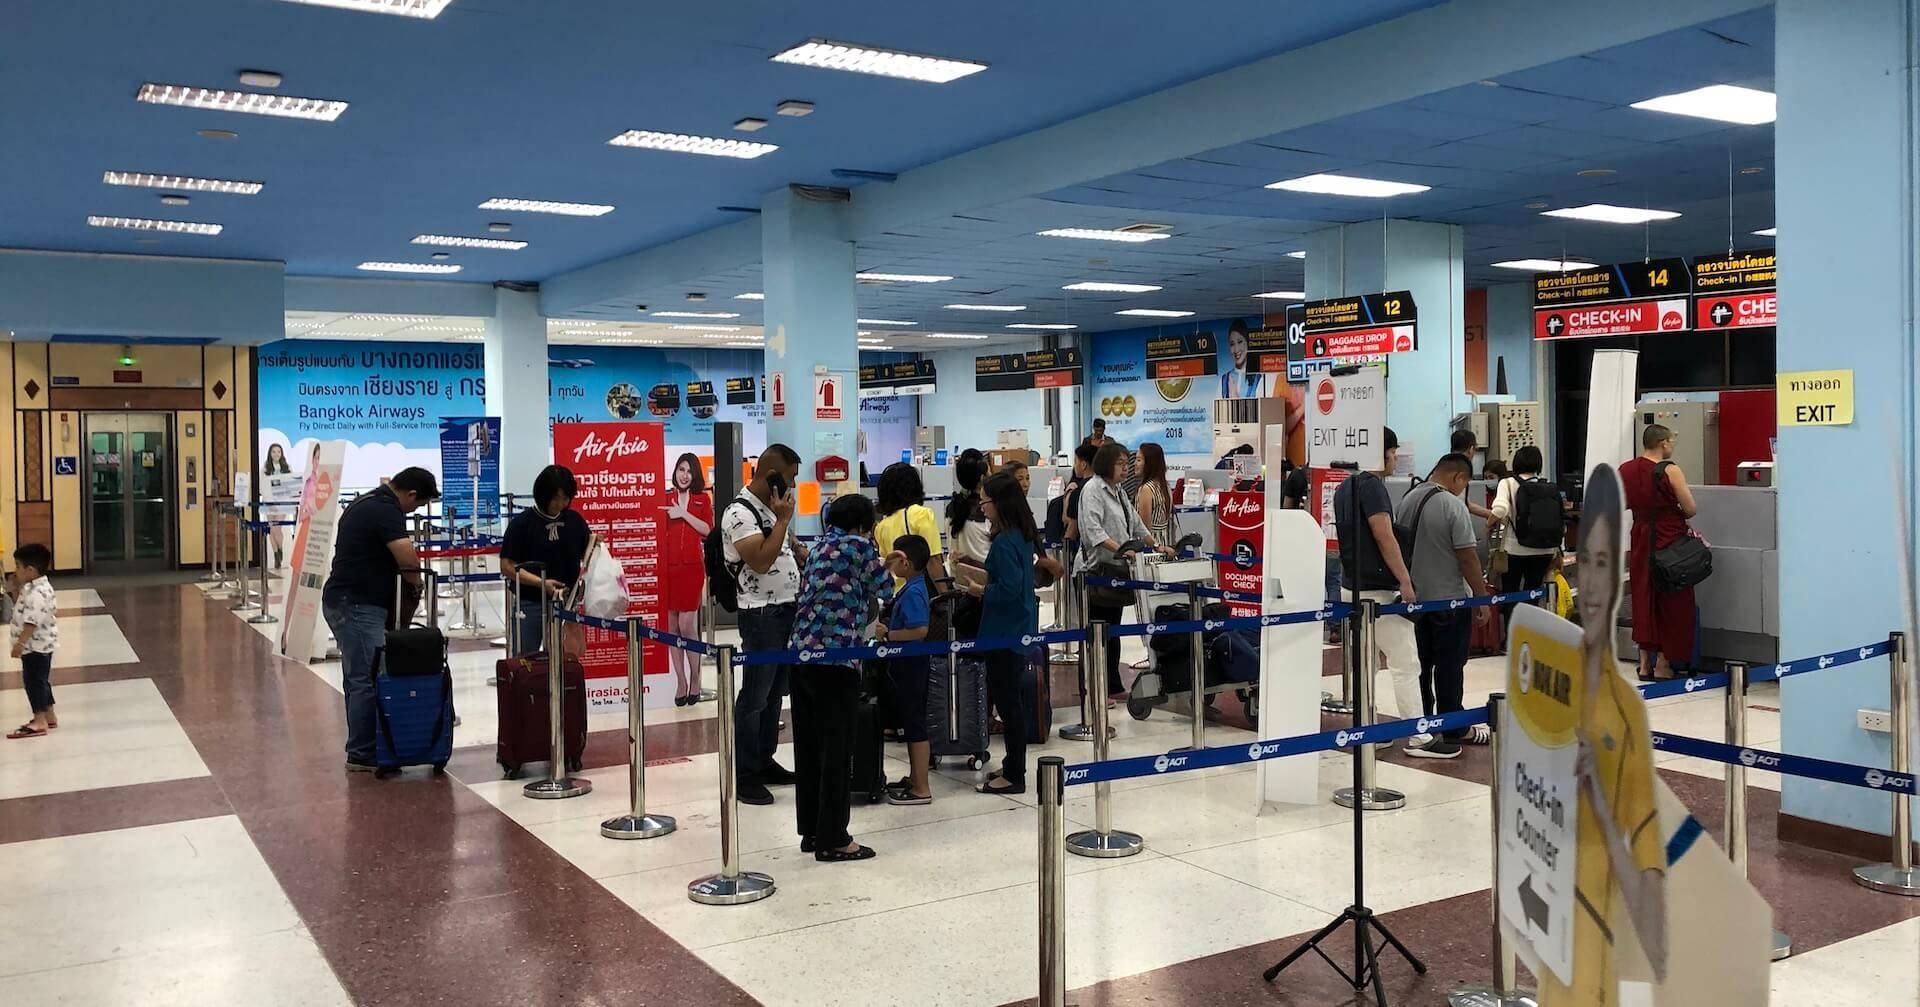 Chiang Rai Airport Check-In